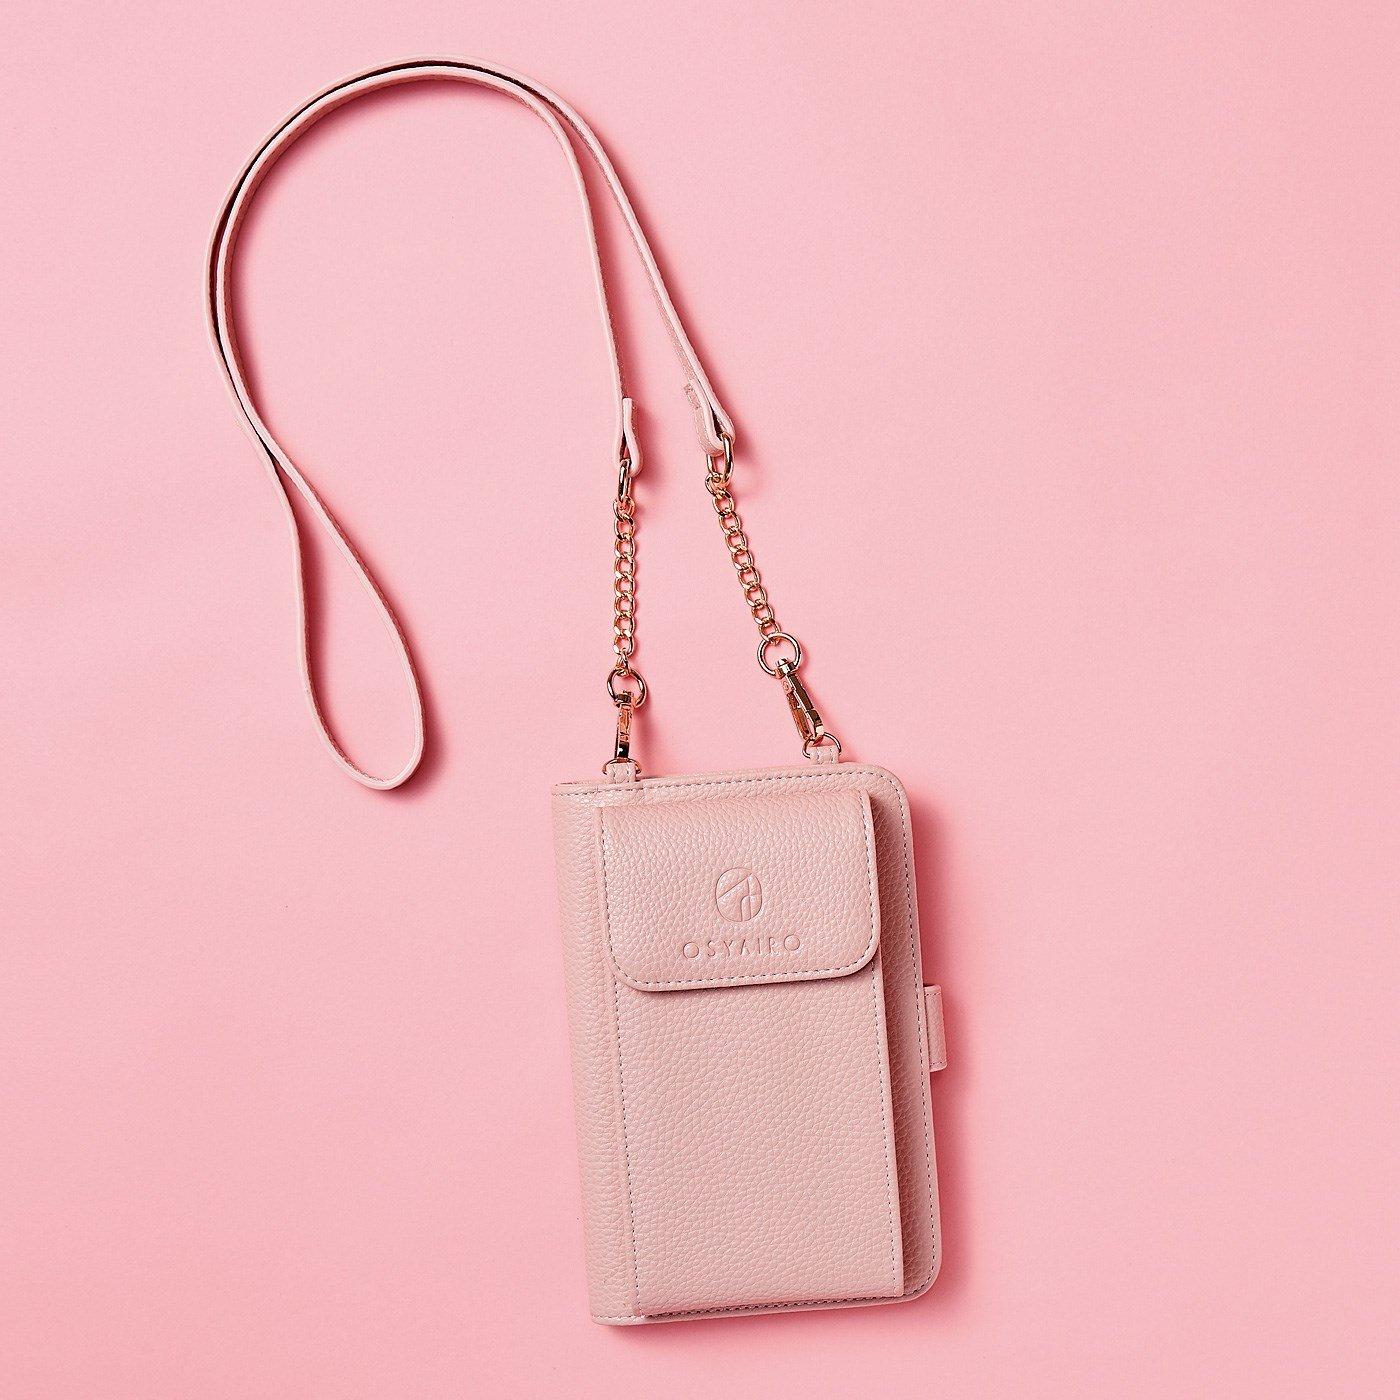 OSYAIRO フォトポケットが付いた スマホ&おさいふポーチ〈ピンク〉